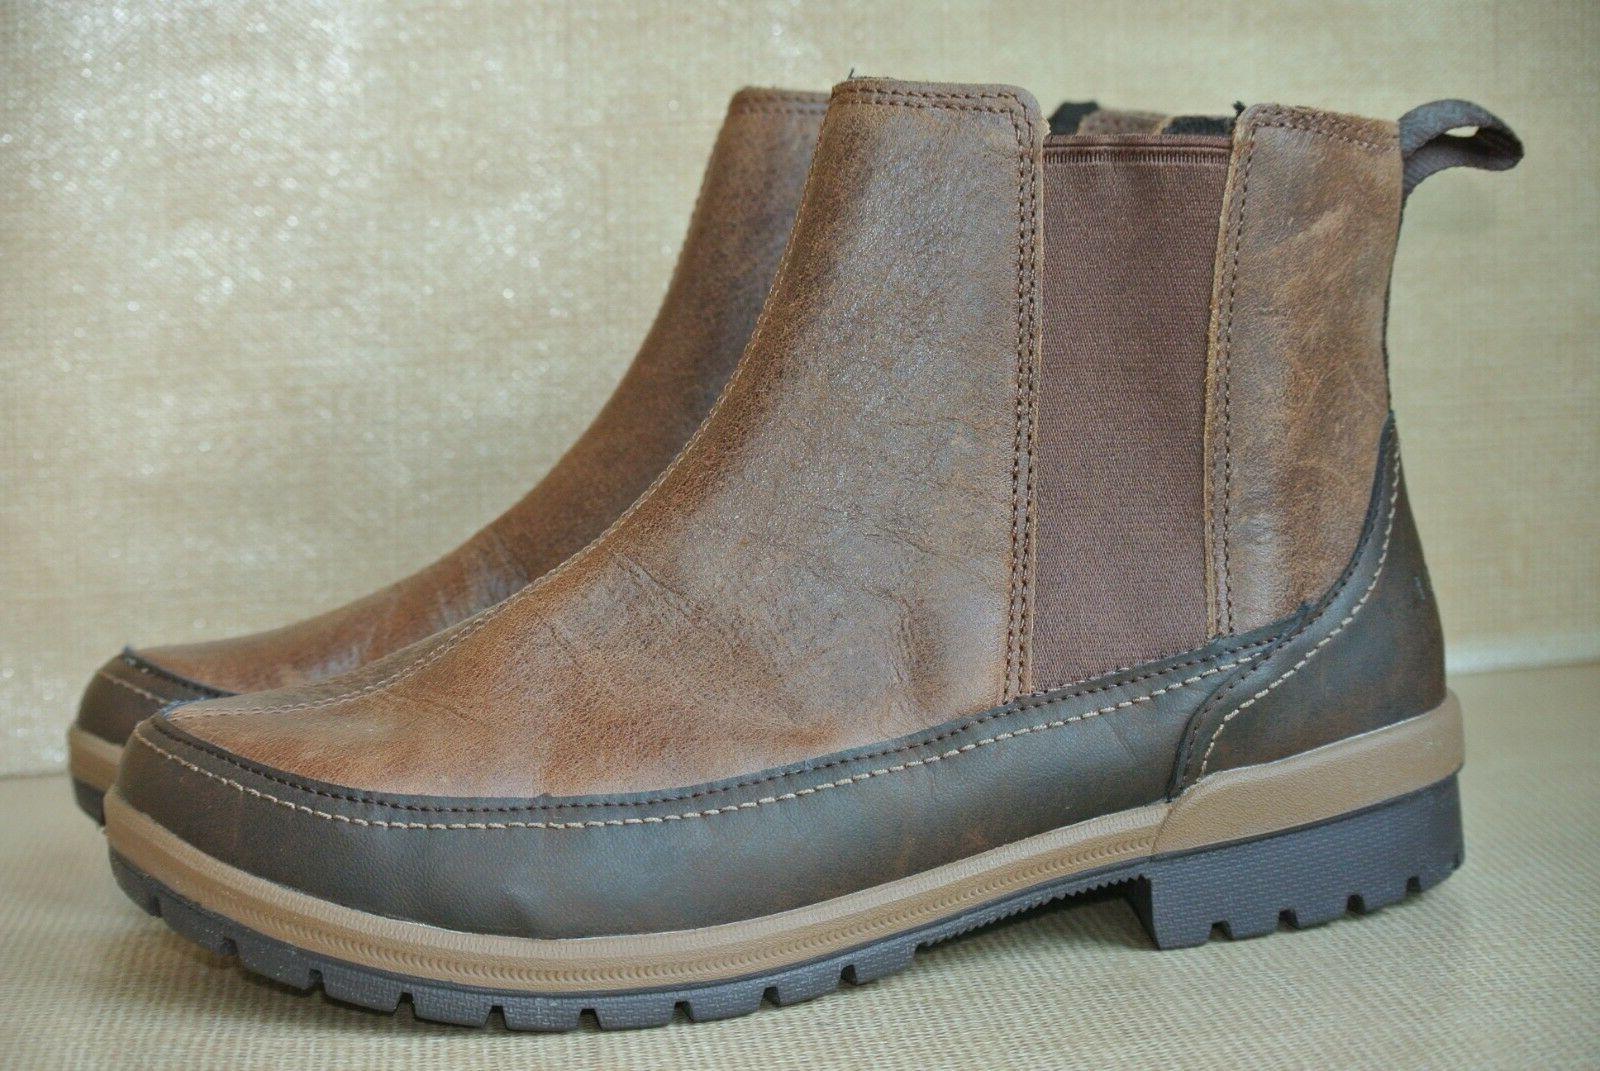 NEW Merrell Womens Sz 9.5 M Leather Winter